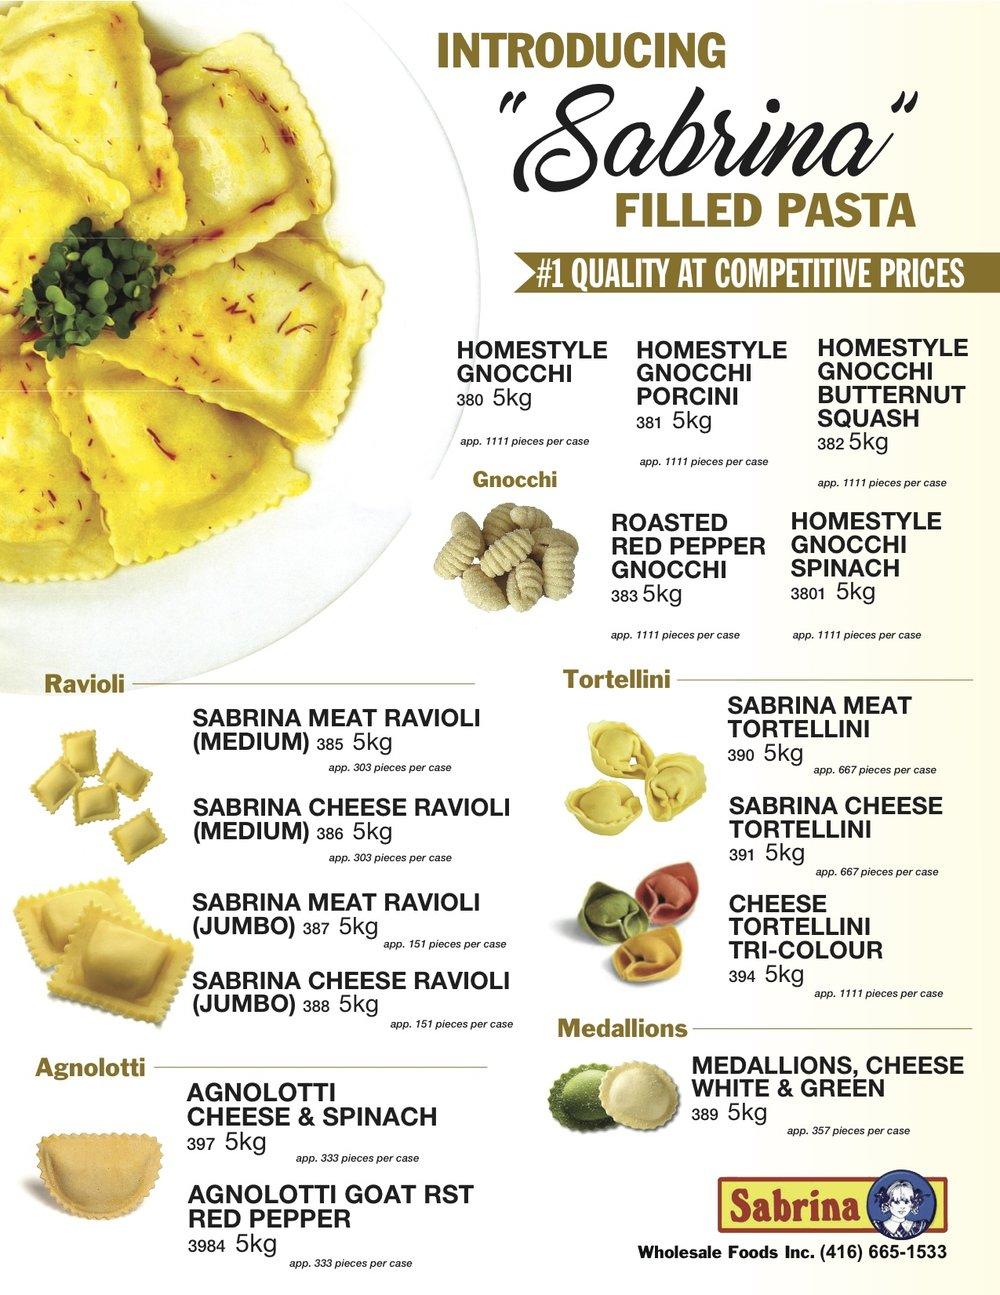 Sabrina Filled Pasta .jpg